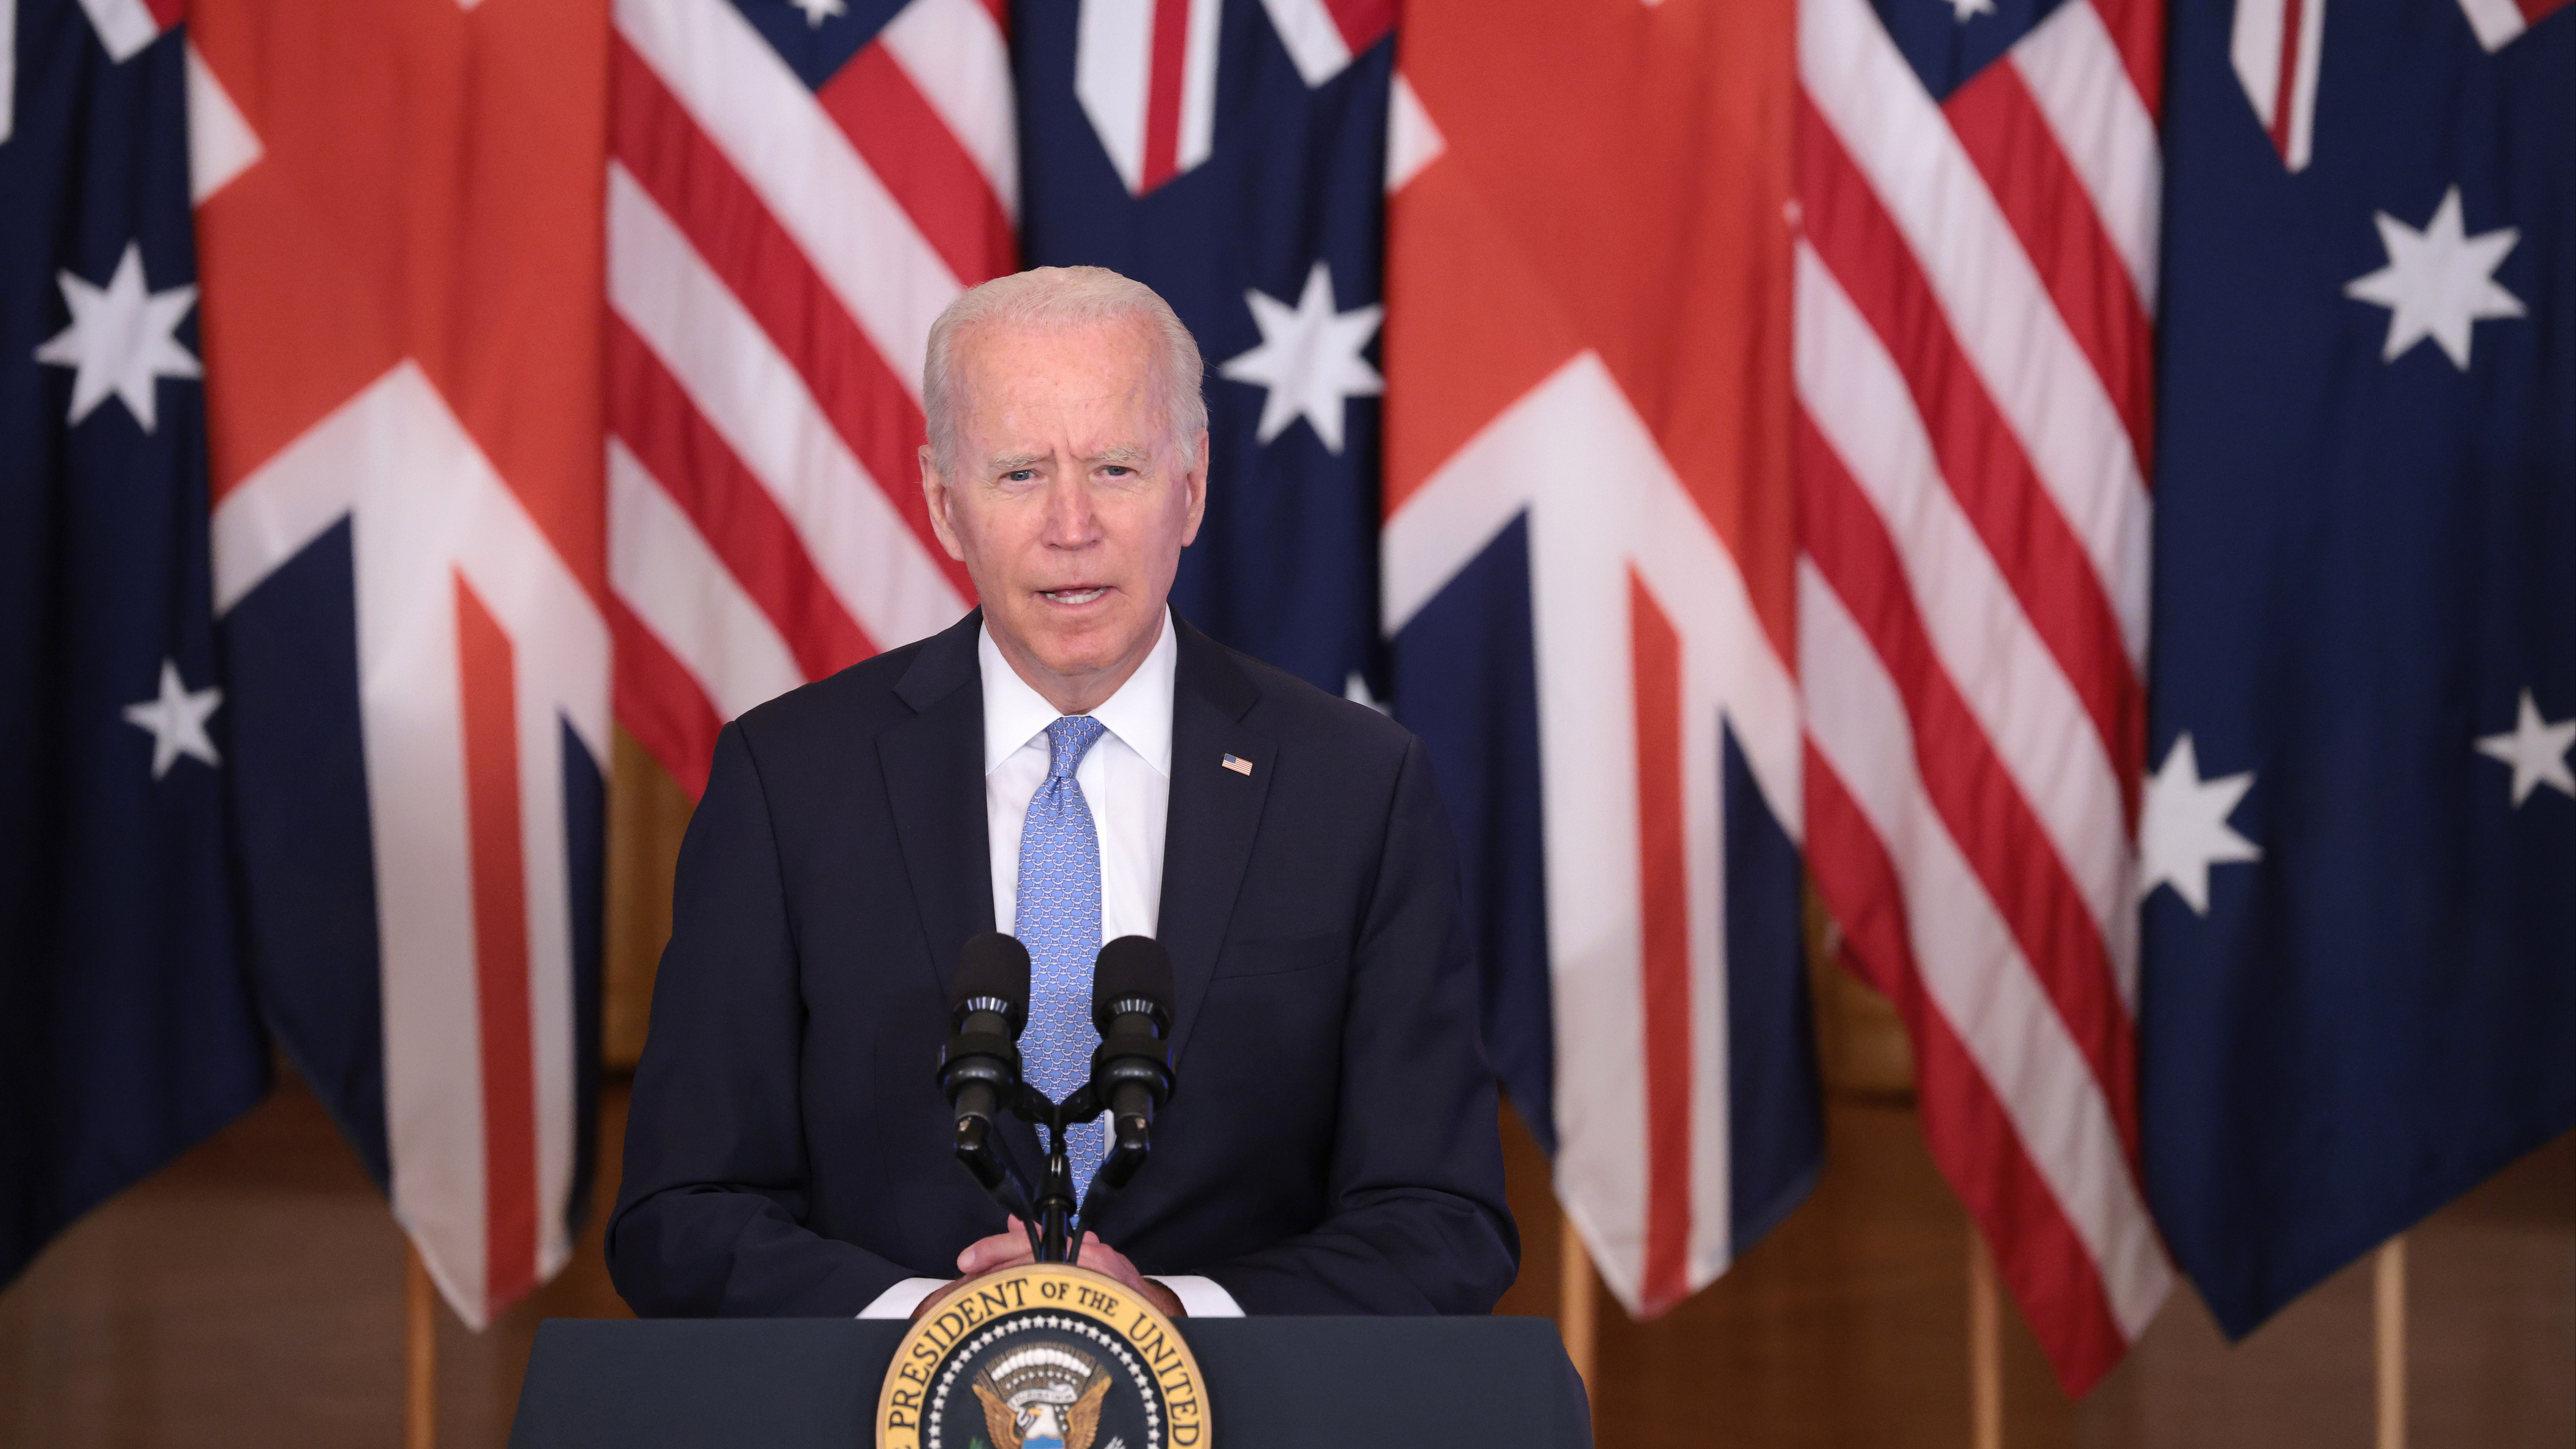 President Joe Biden speaks during an event in the East Room of the White House